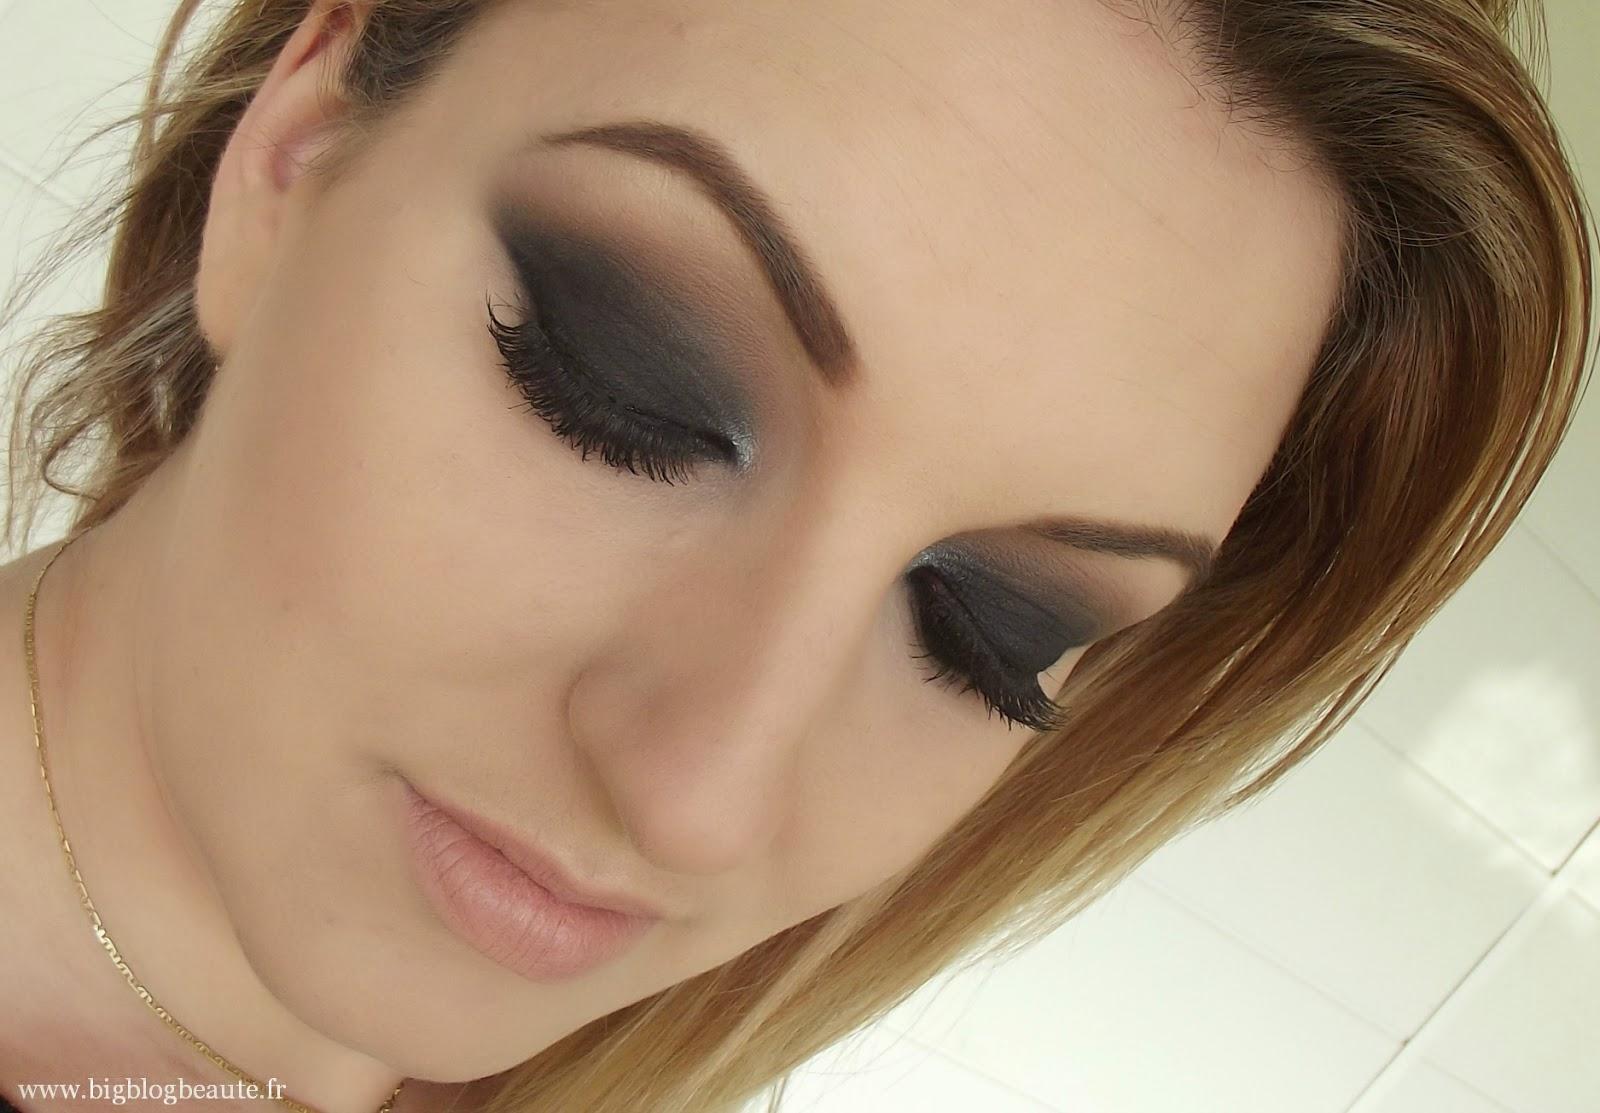 Tuto comment faire un smoky eyes big blog beaut - Smoky eyes tuto ...